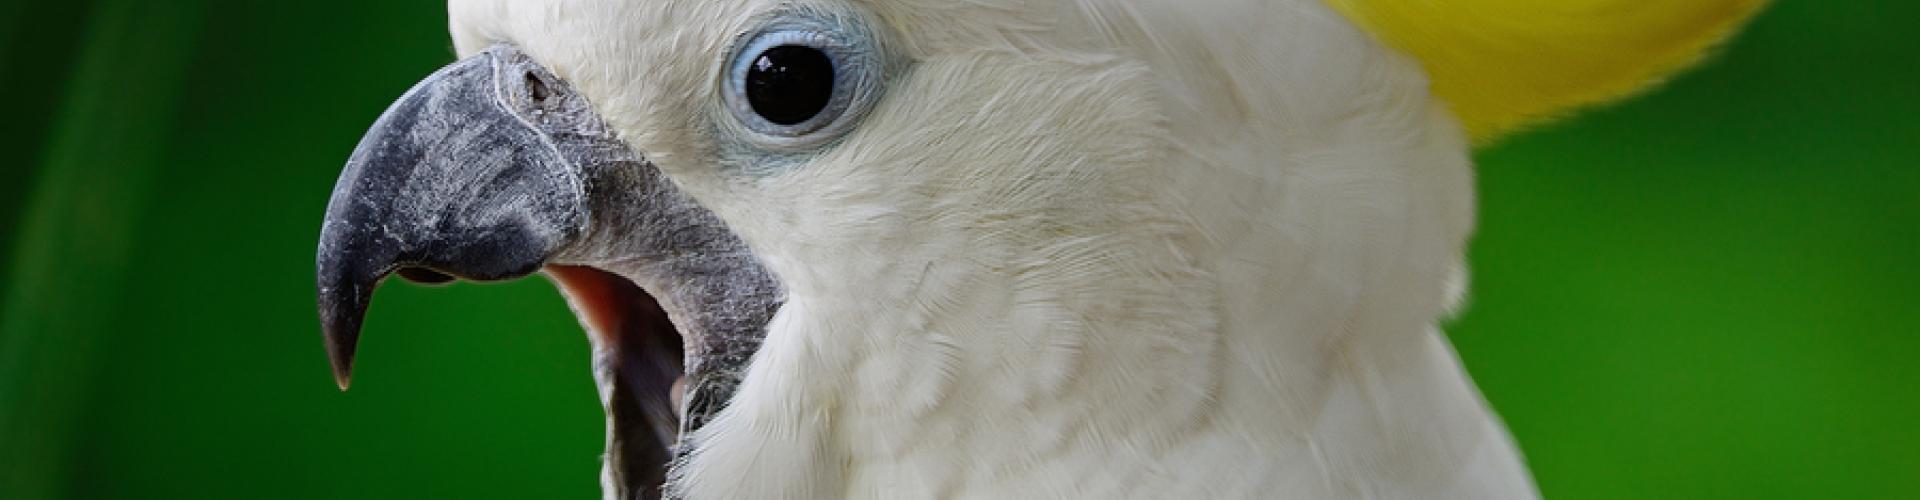 Arizona Exotic Animal Hospital | Veterinary care for exotic